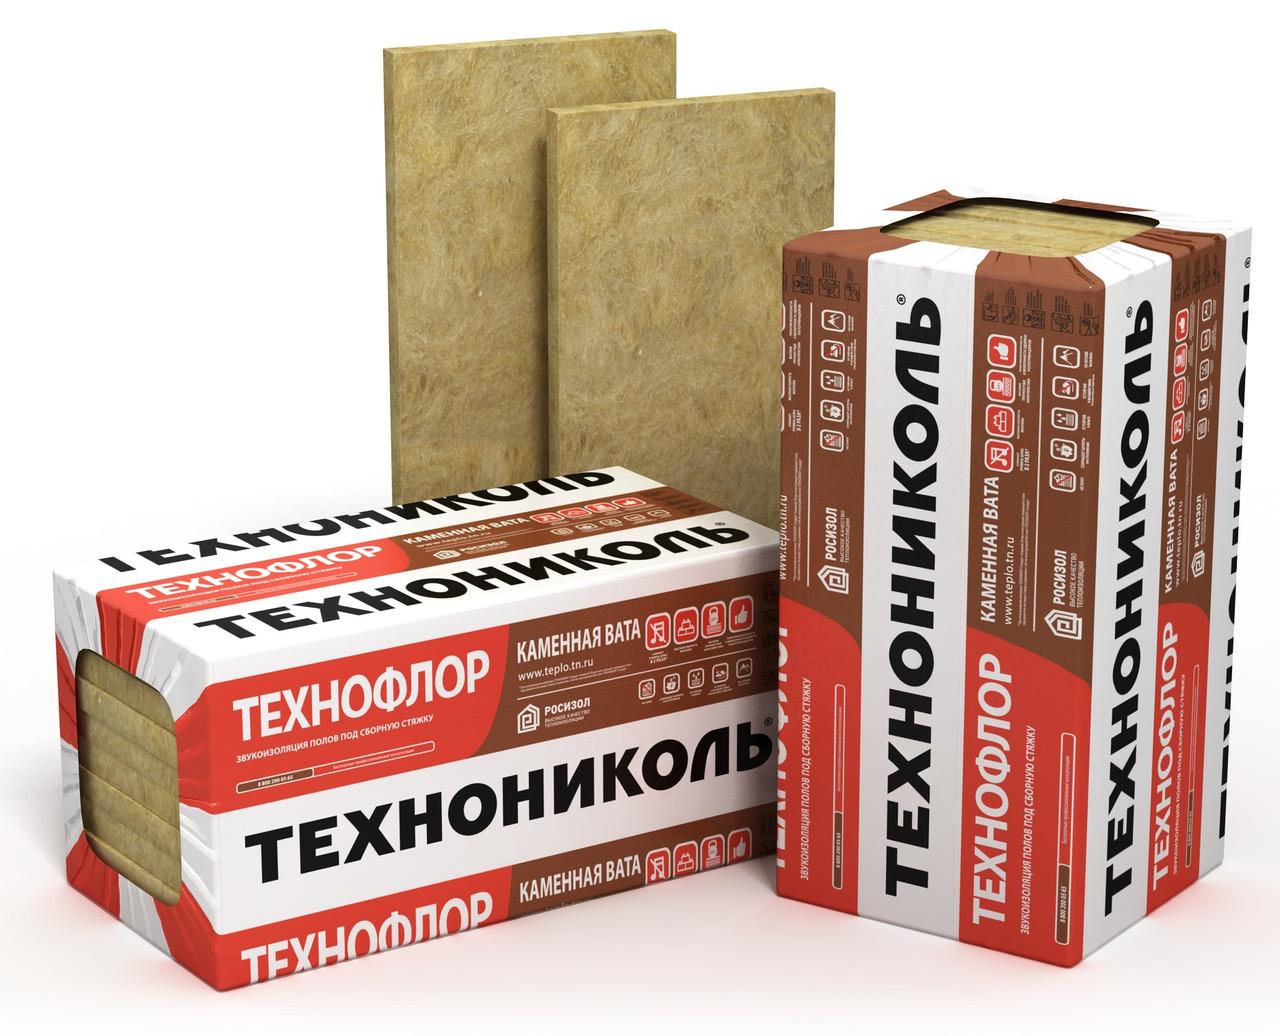 Вата мінеральна Sweetondale Технофлор Проф, 170 кг/куб.м 90 мм